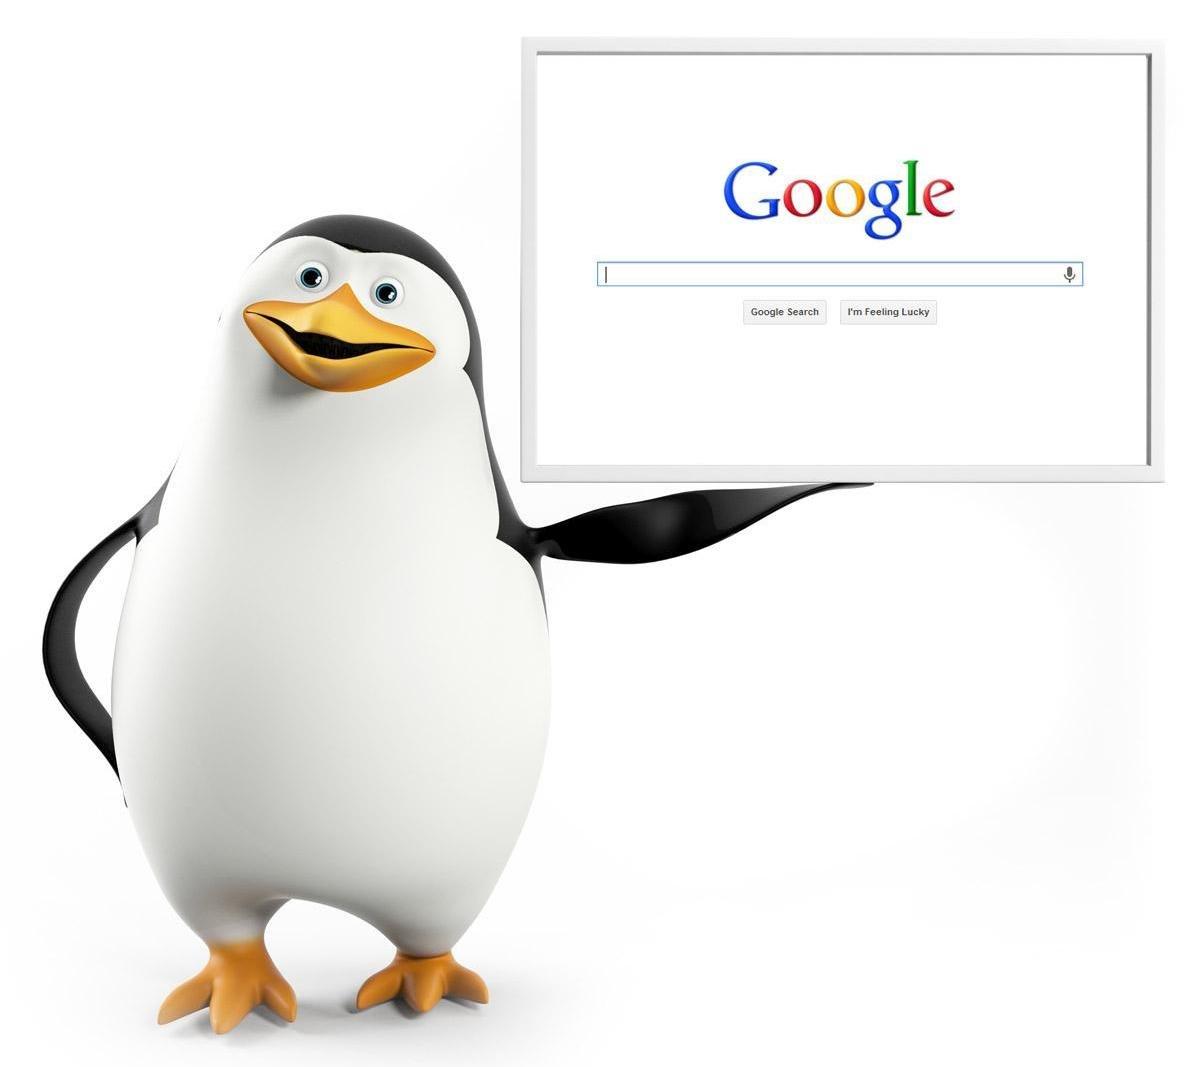 Google: ���� ������ ����� ��-��� ��������� ������ � ��������� ������